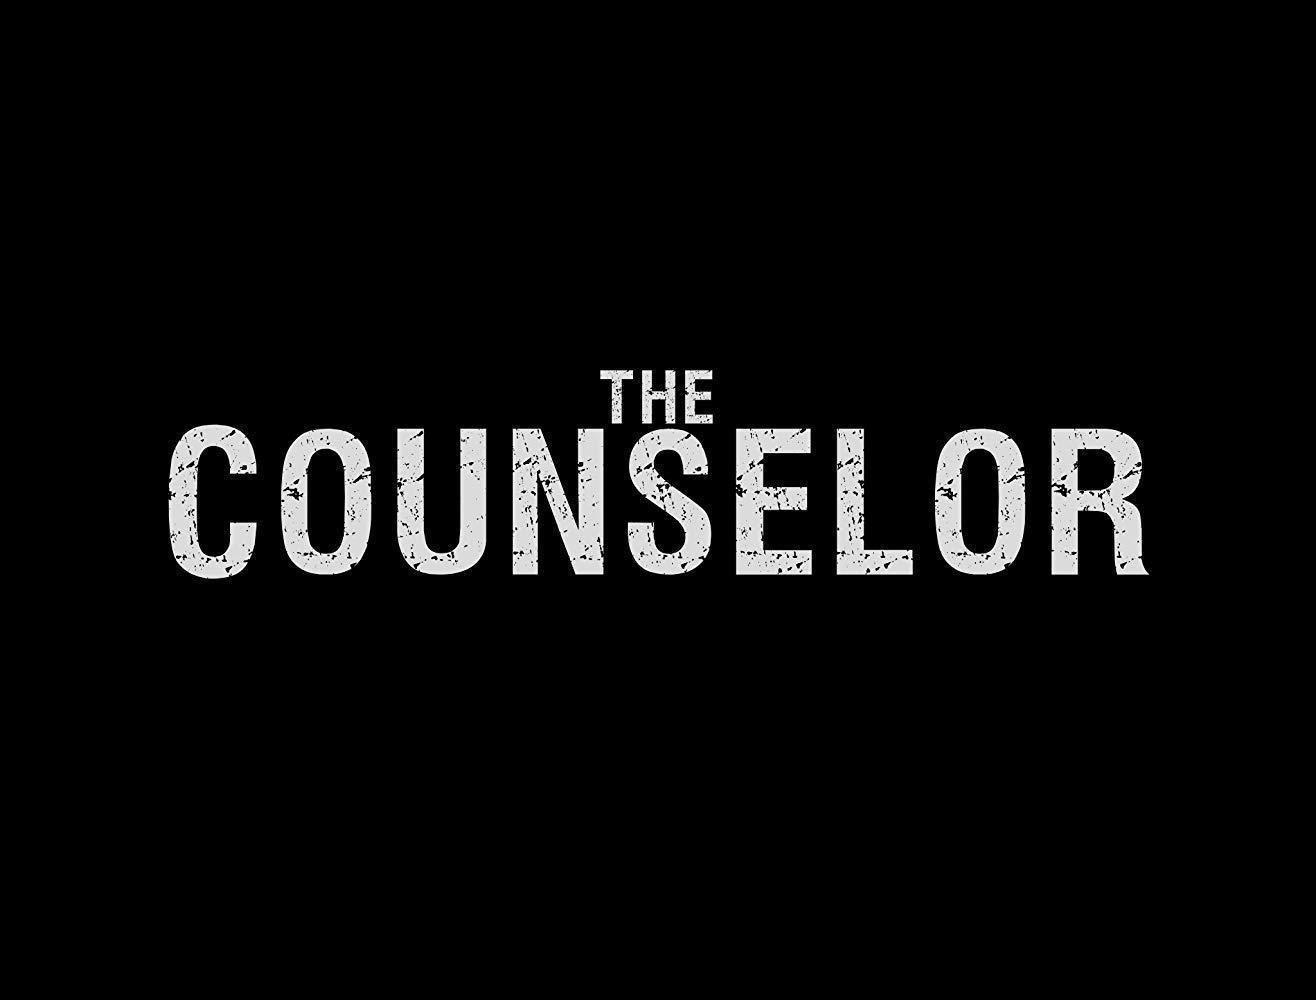 مشاهدة فيلم The Counselor 2013 HD مترجم كامل اون لاين